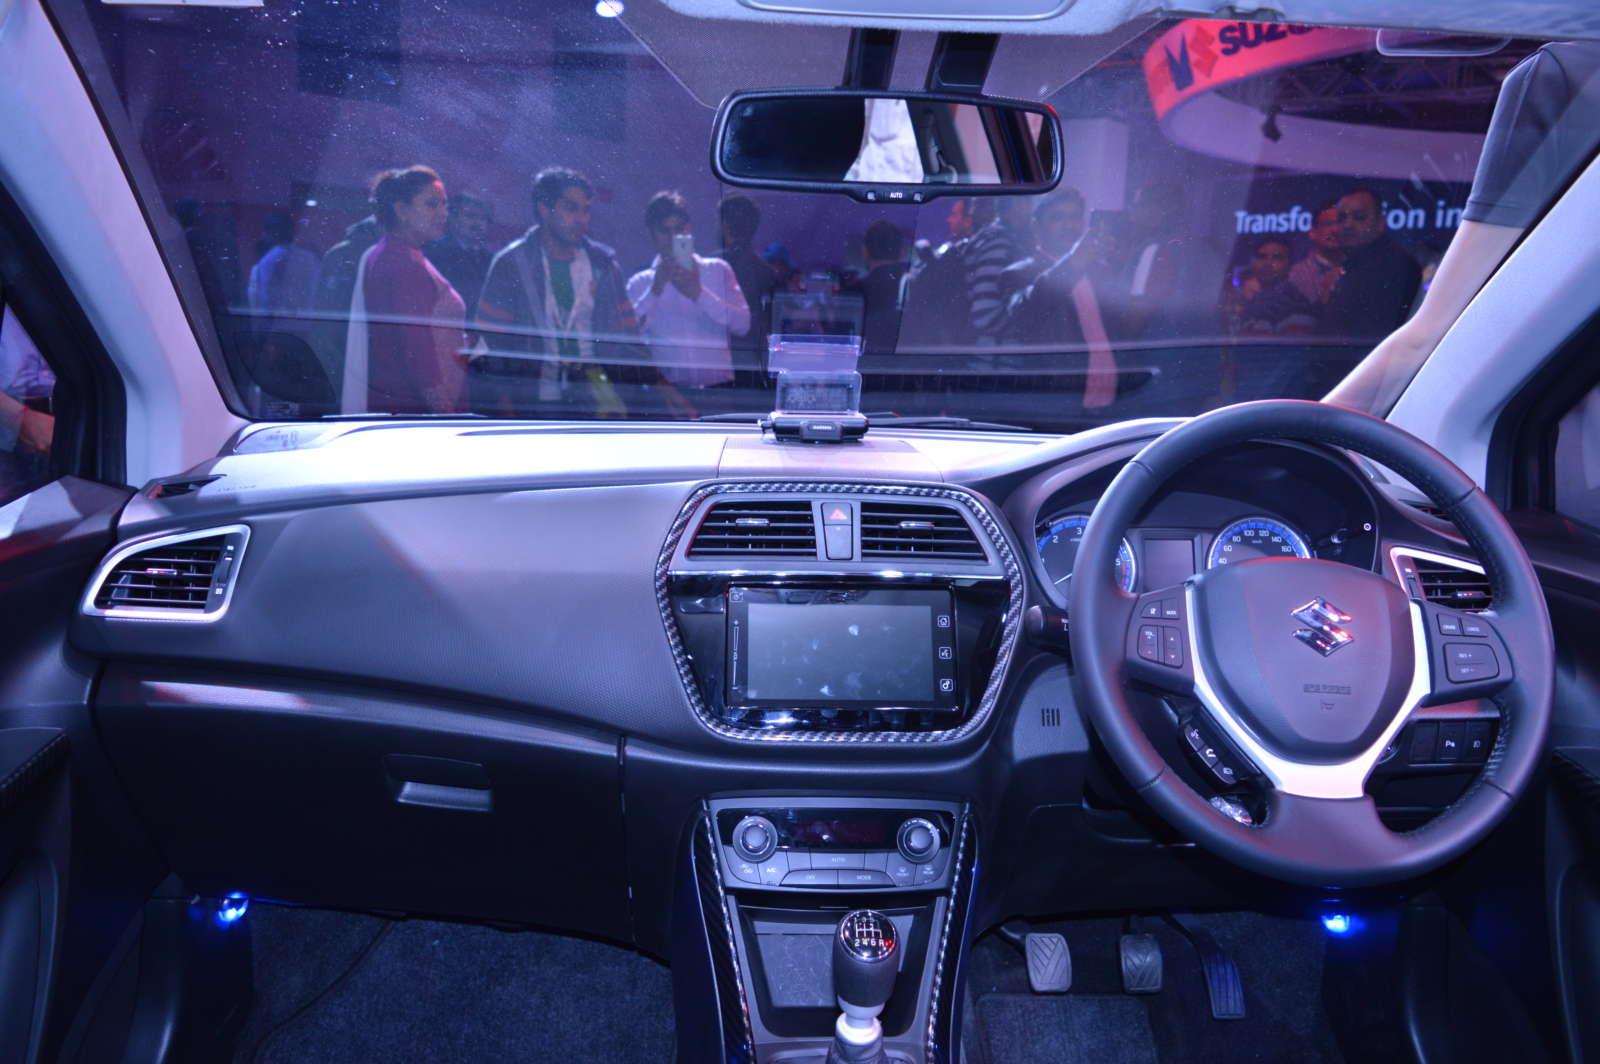 Maruti Suzuki S-Cross LImited edition (22)